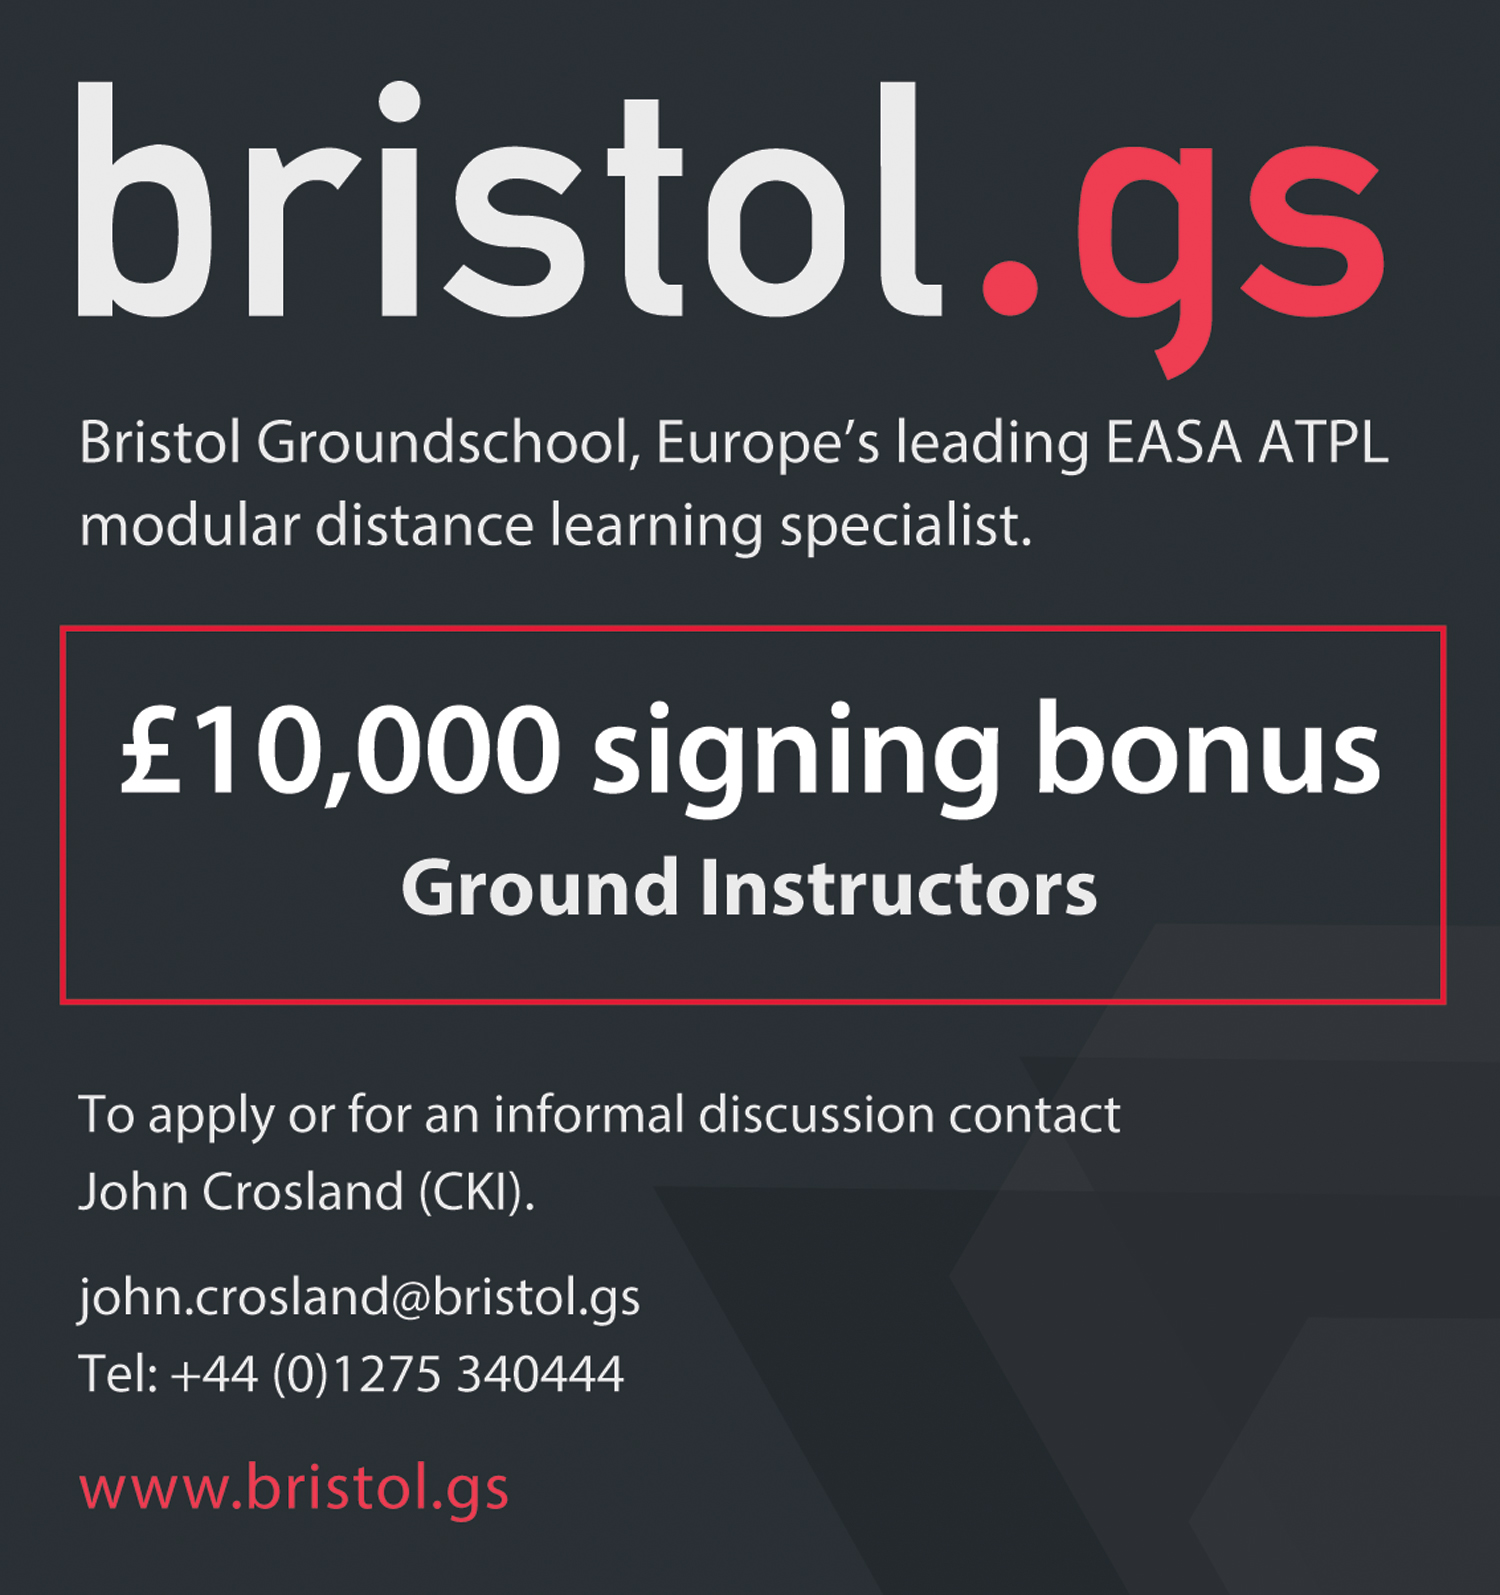 Bristol GS instructors